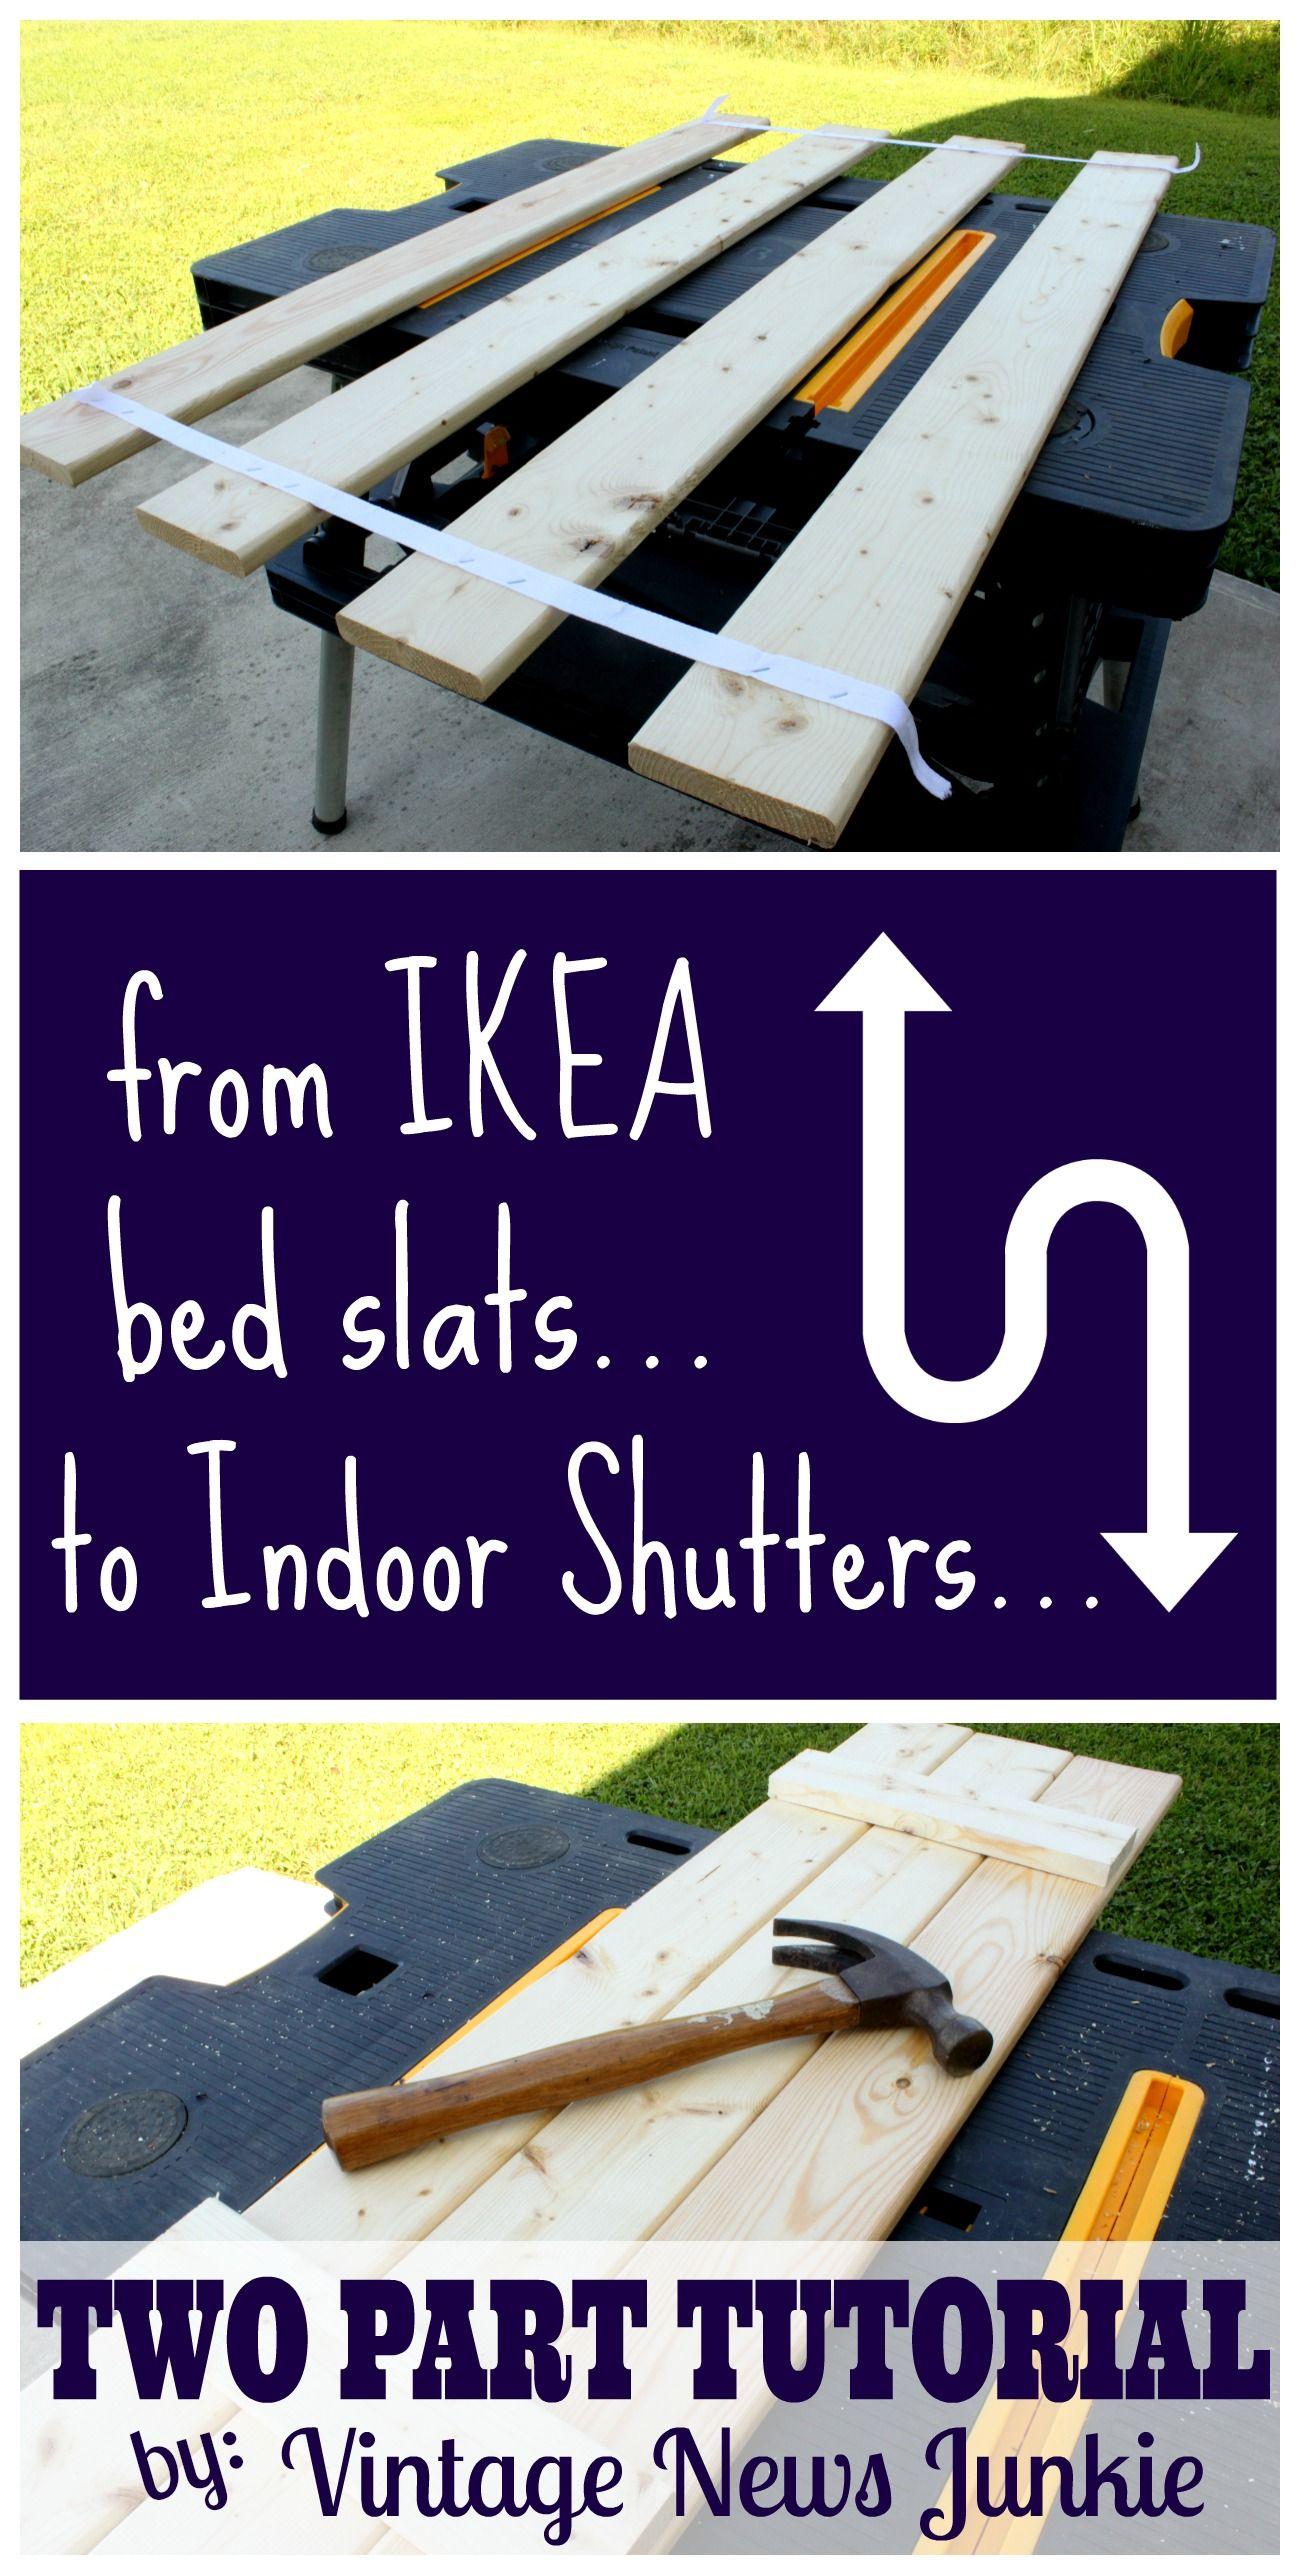 Rockin' Indoor Shutters made from IKEA Bed Slats Tutorial